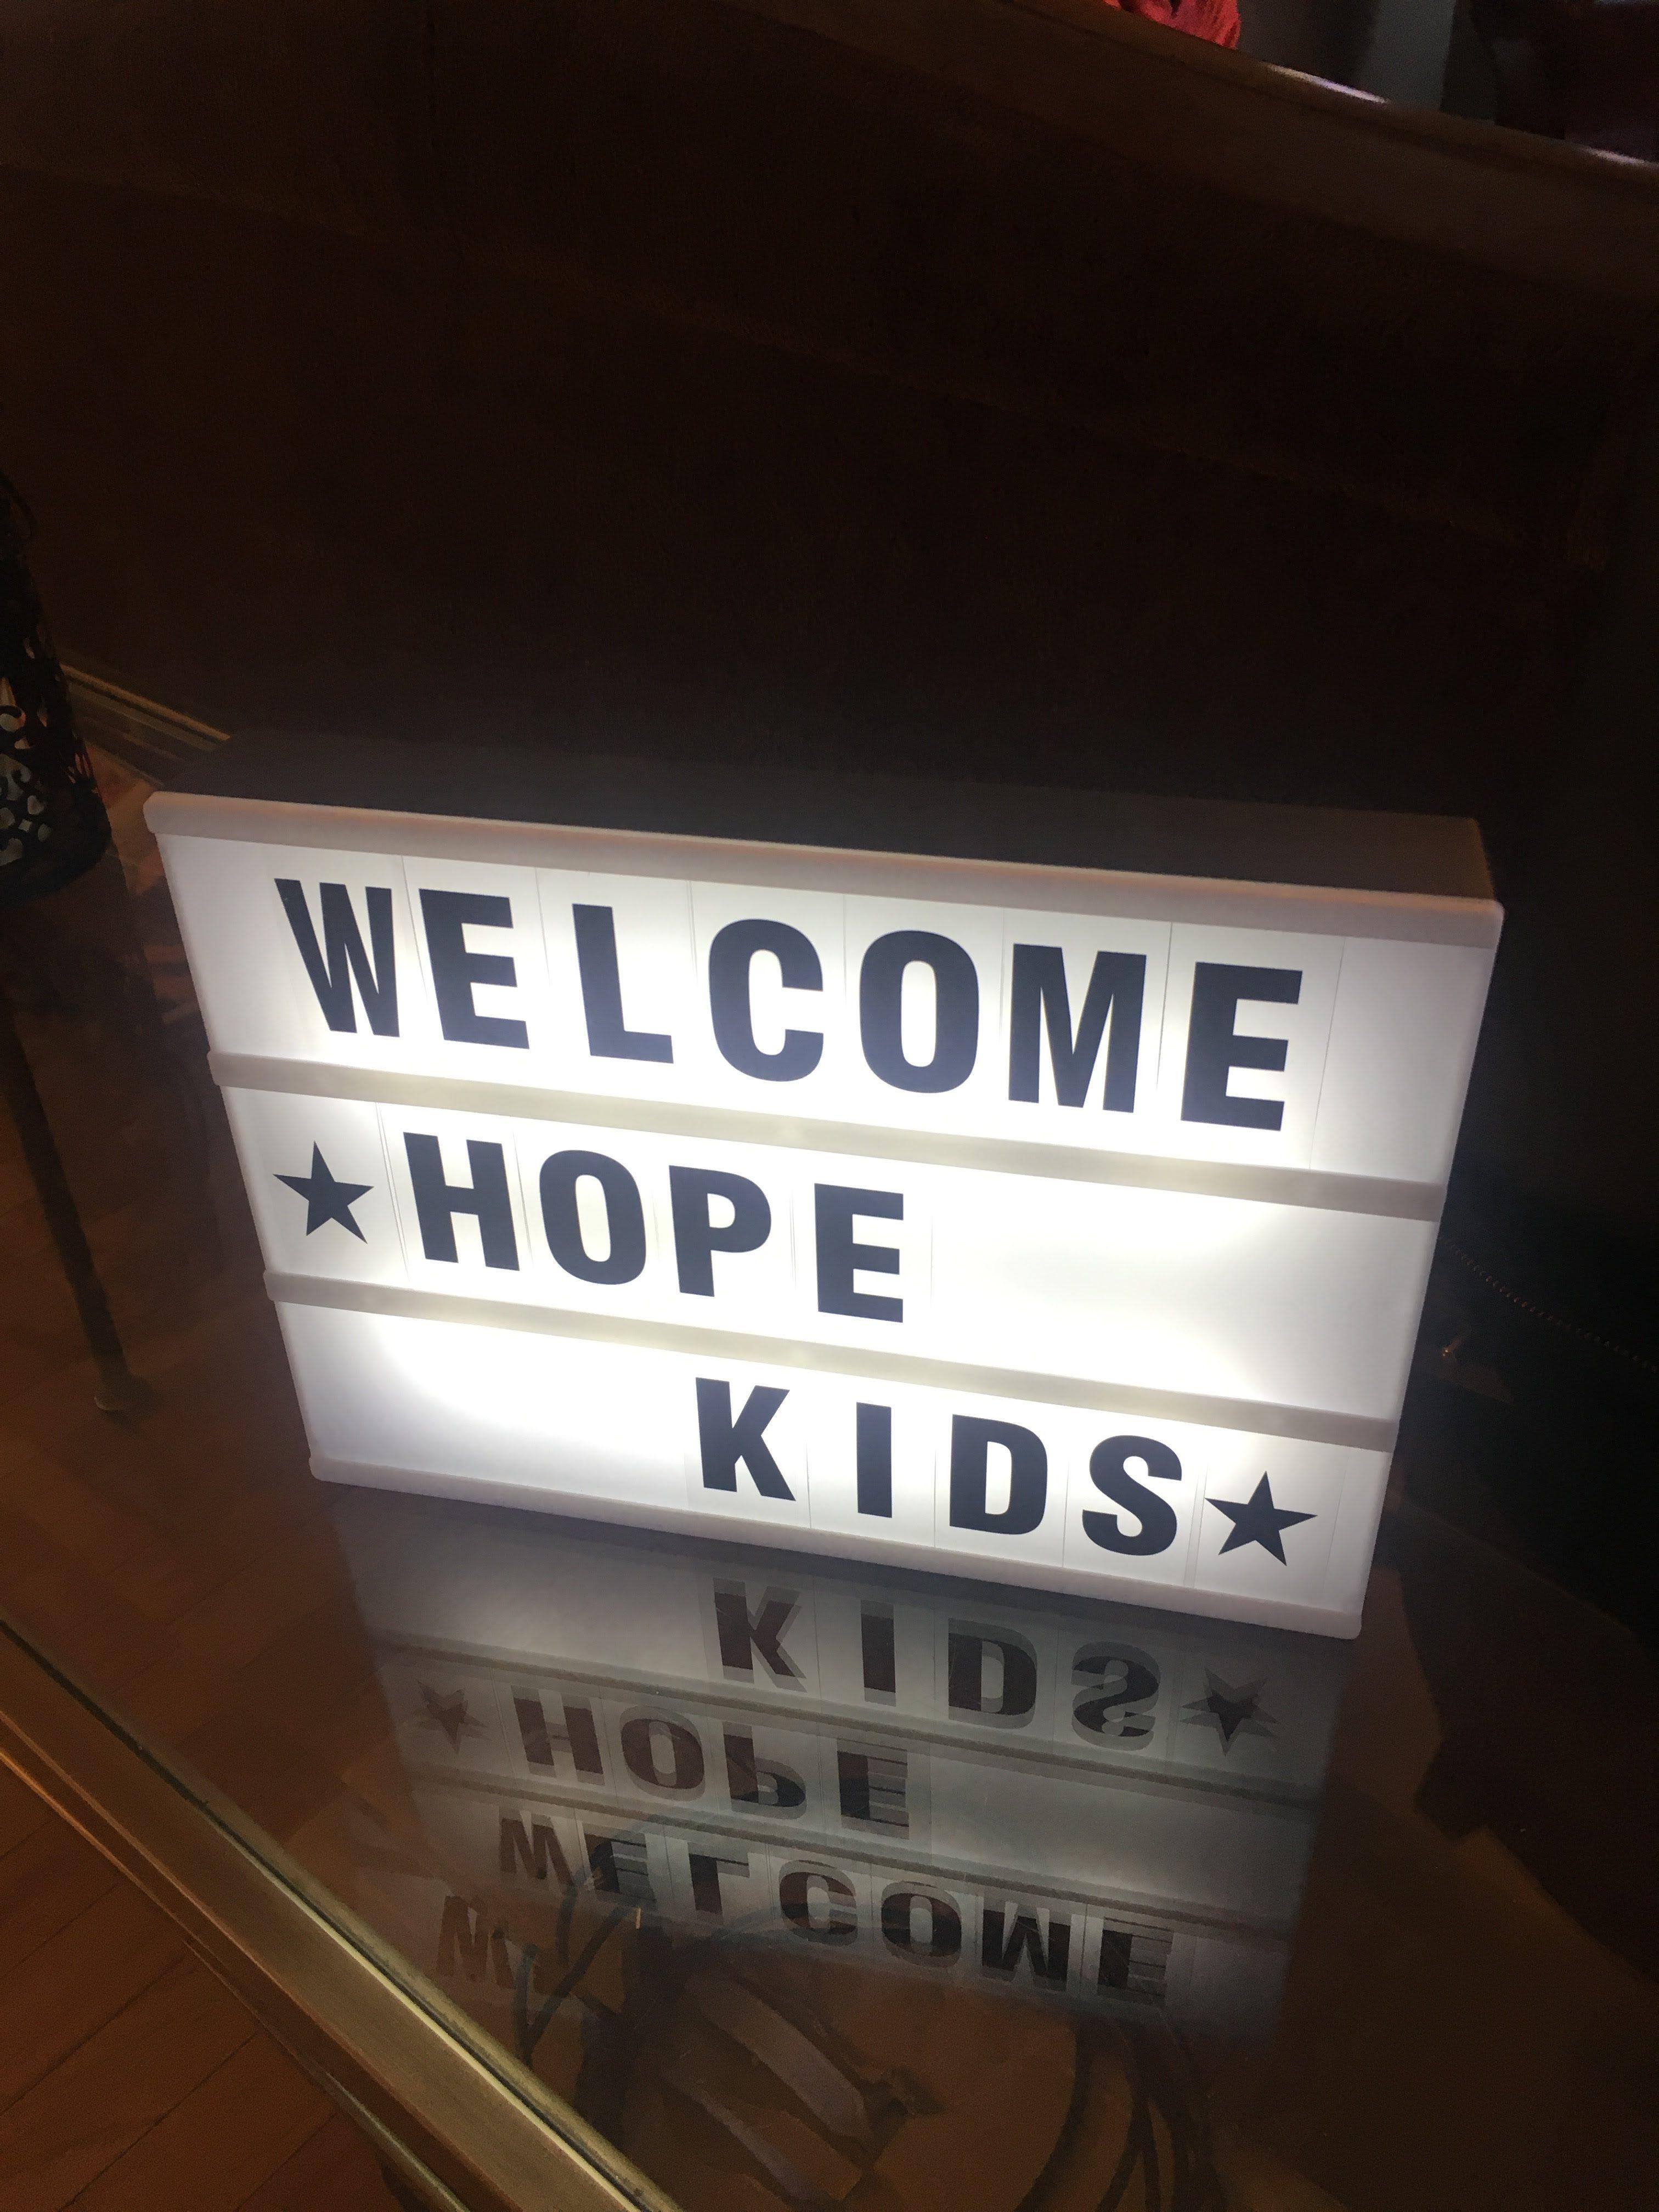 WELCOME TO HOPE KIDS!